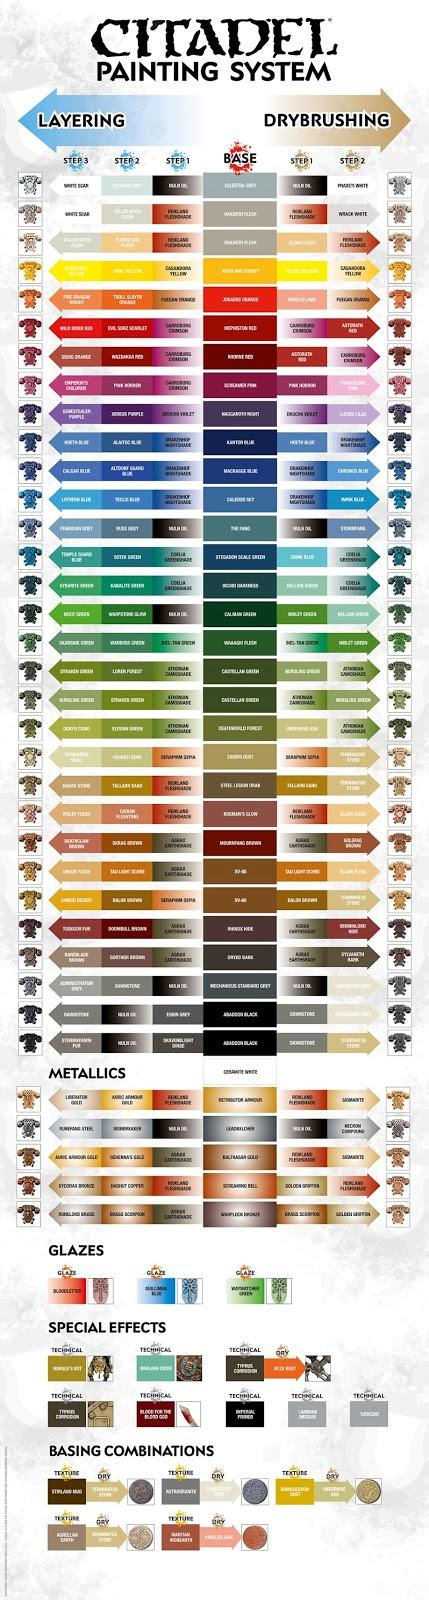 Citadel Paints Conversion Chart : citadel, paints, conversion, chart, Citadel, Paint, Chart, Gallery